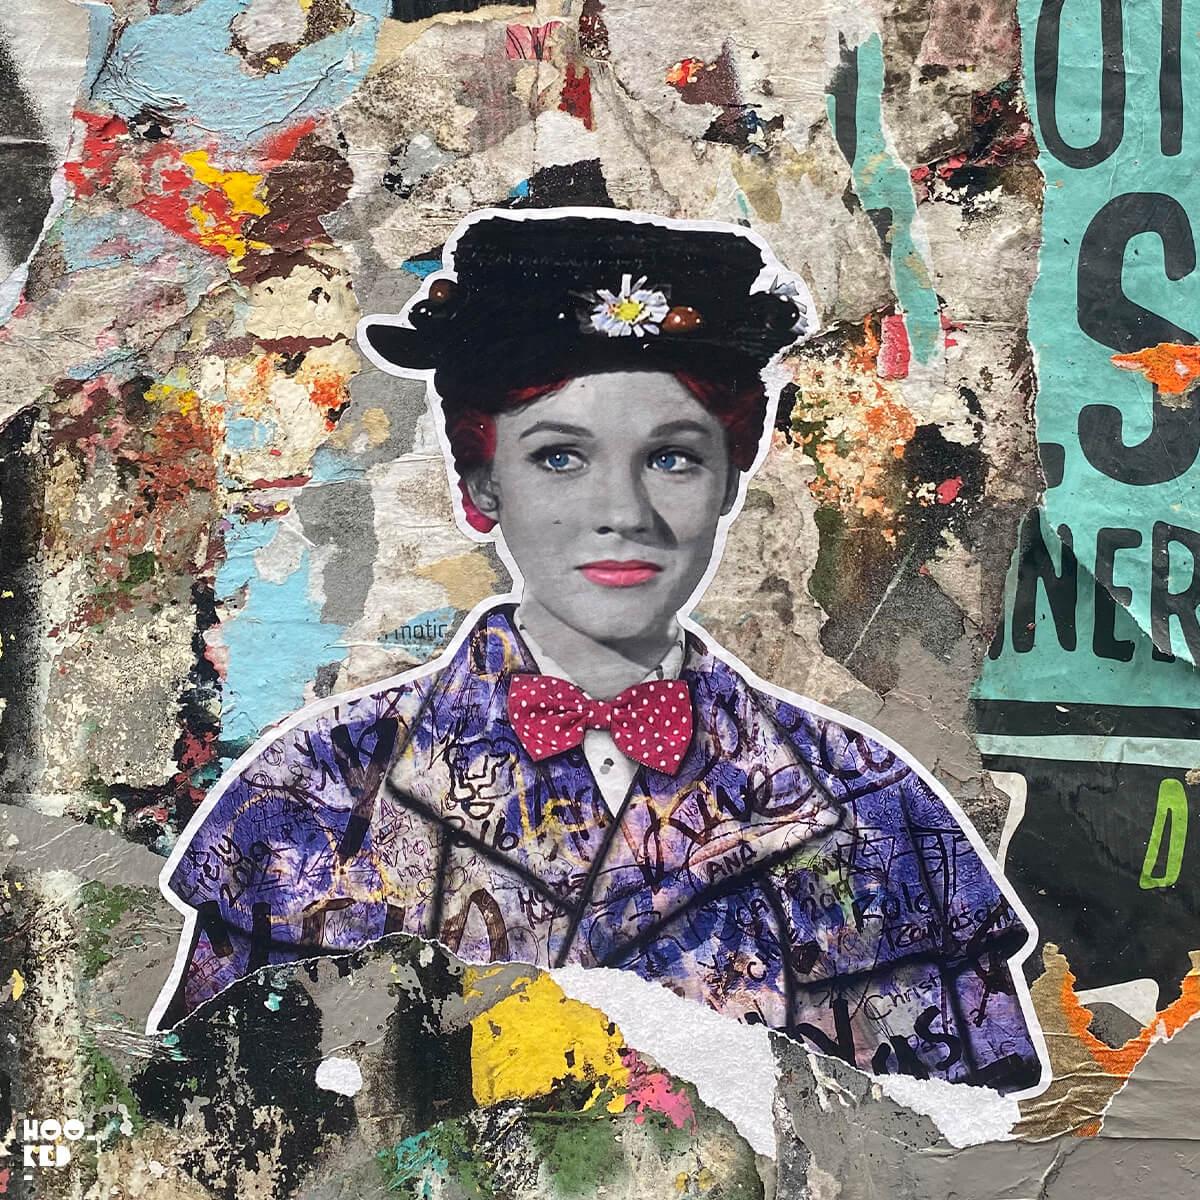 5 Shoreditch Street Art Hotspots for Paste-ups - The Postman